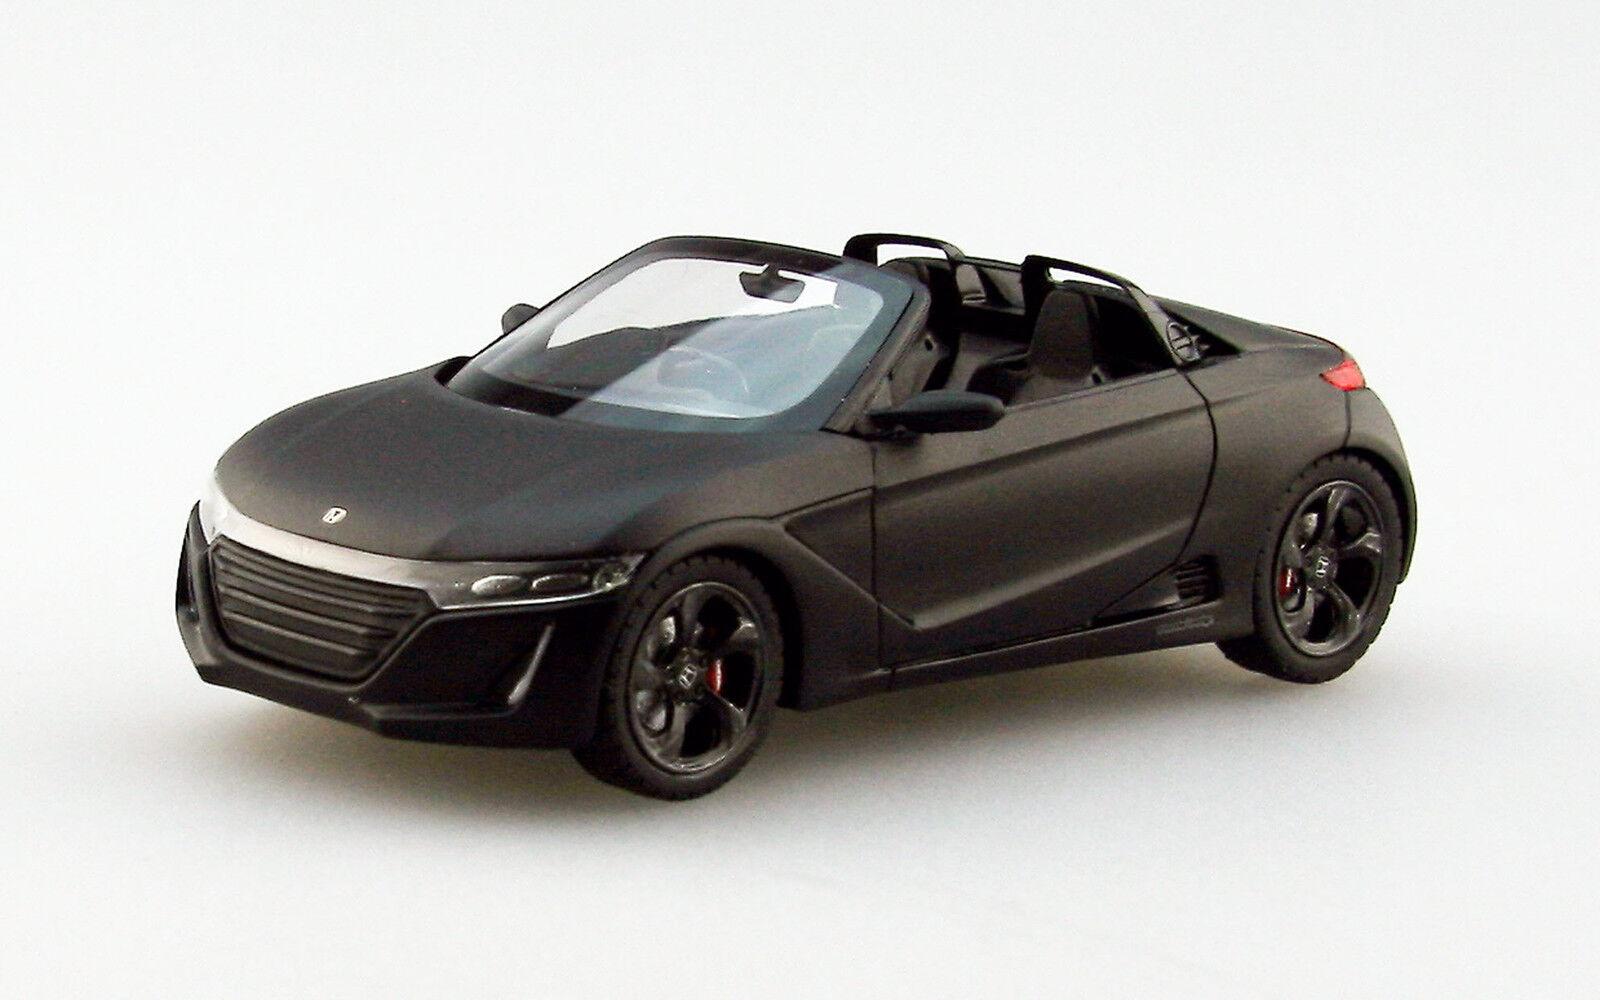 Ebbro 45232 1 43 Honda S660 Tokyo Auto Salón de resina de 2015 nero Mate